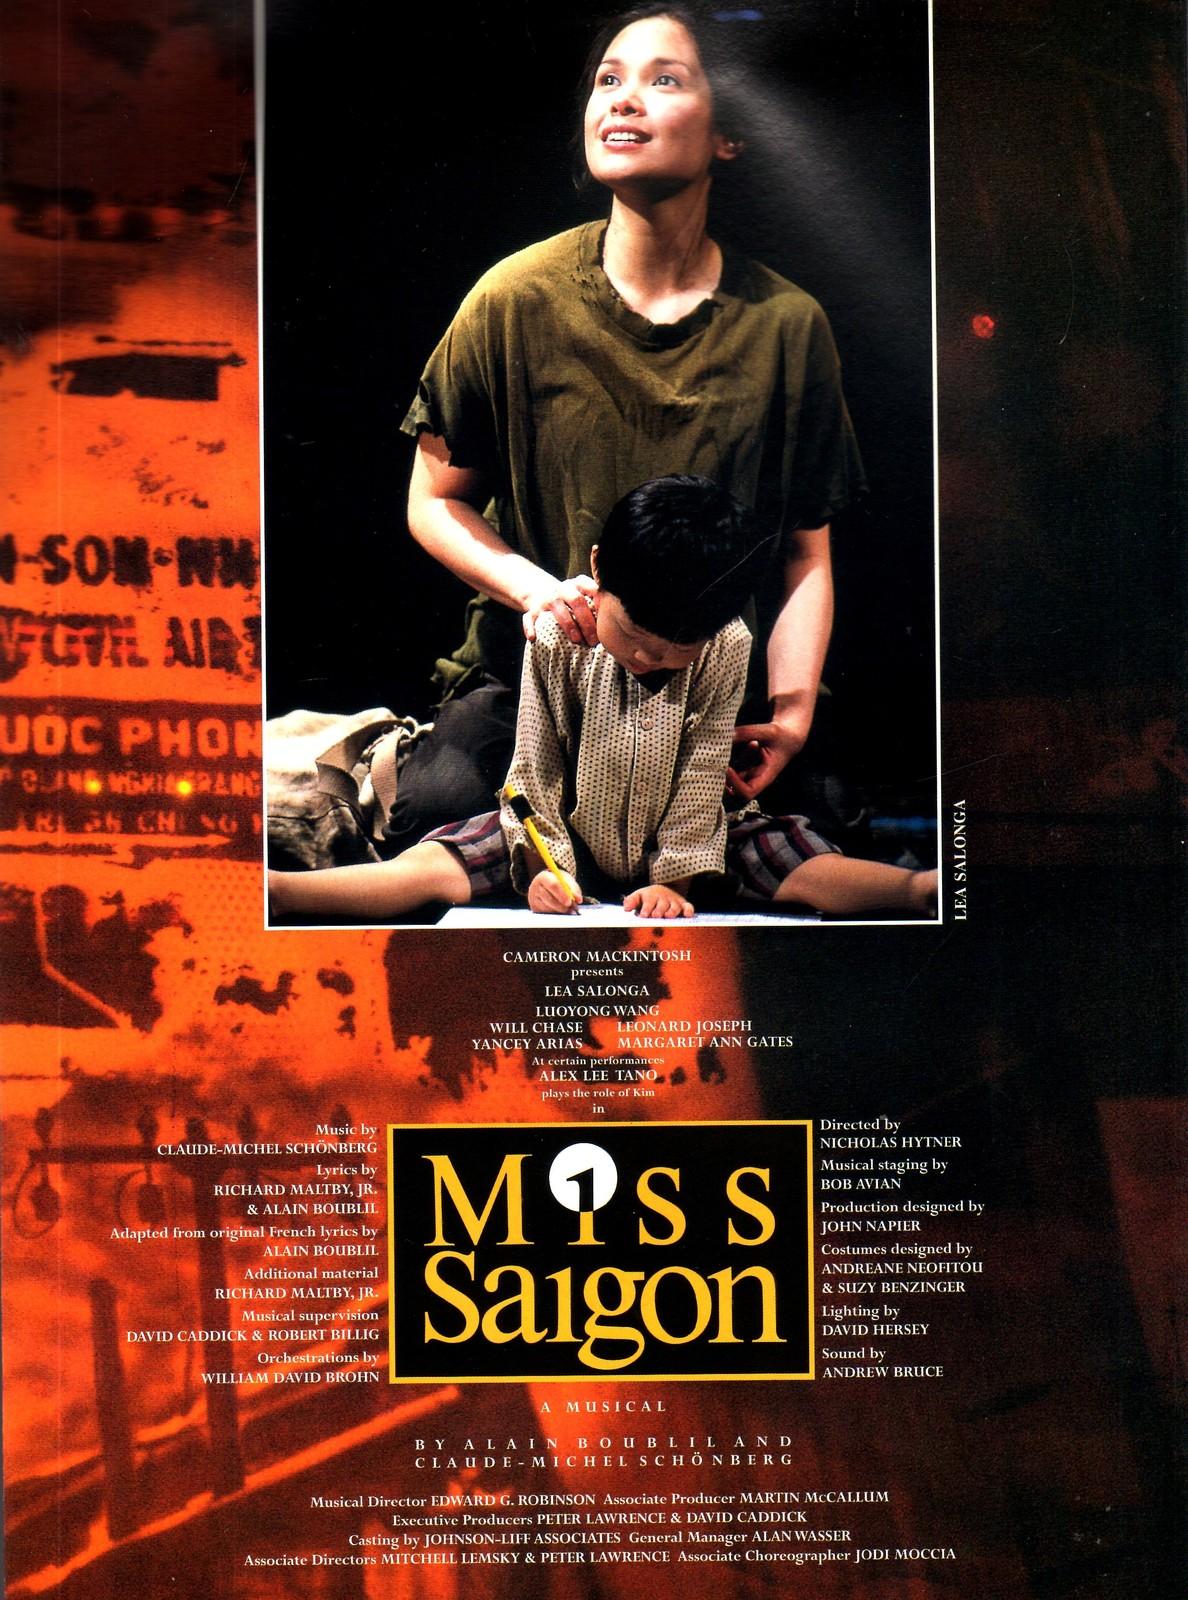 Miss Saigon (Play Book) image 4